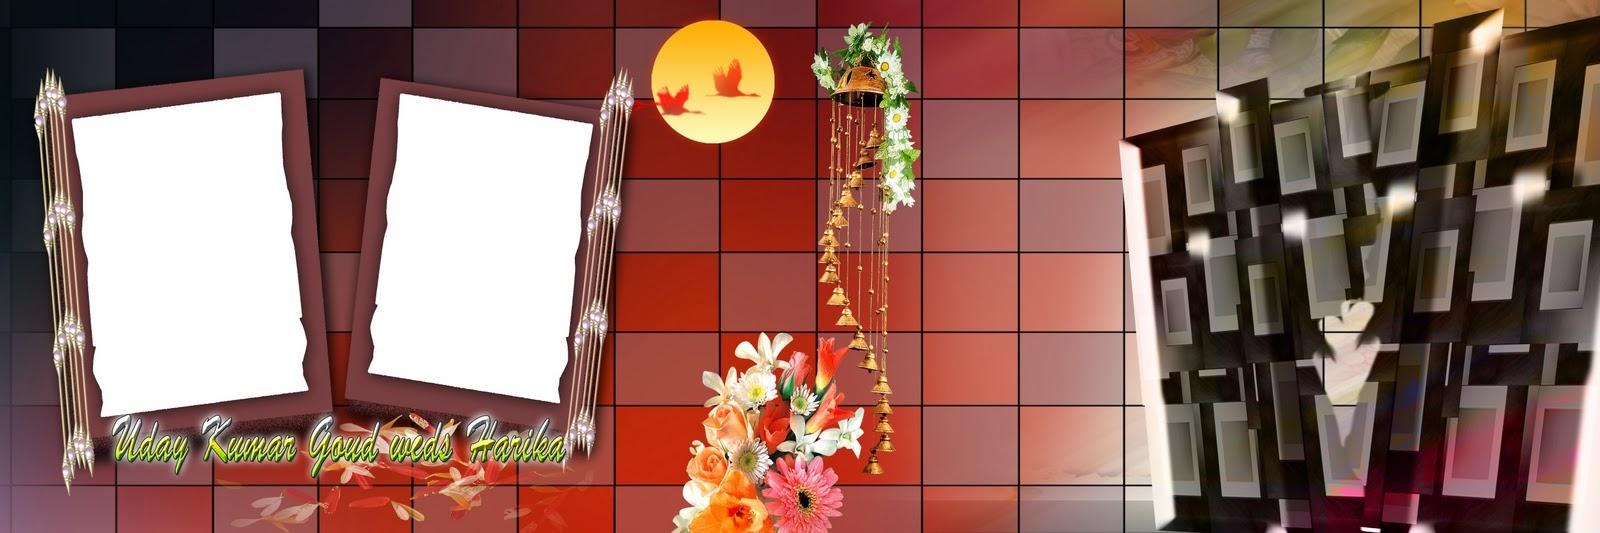 Photoshop backgrounds 12x36 indian wedding album templates design 10 - Karizma Album Background Luckystudio4u